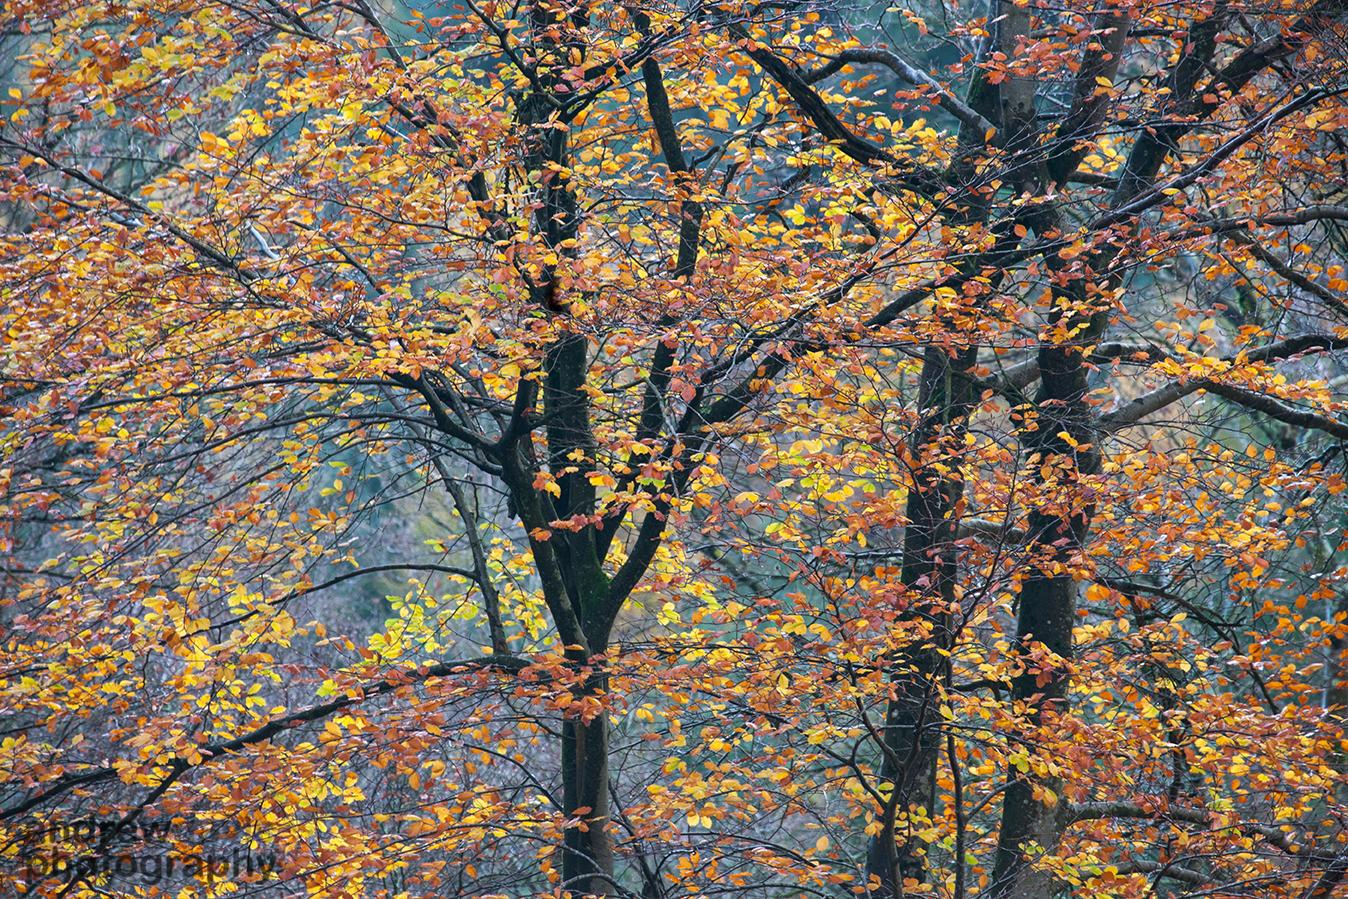 Autumn Beech, Triscombe, Qauntocks, Somerset